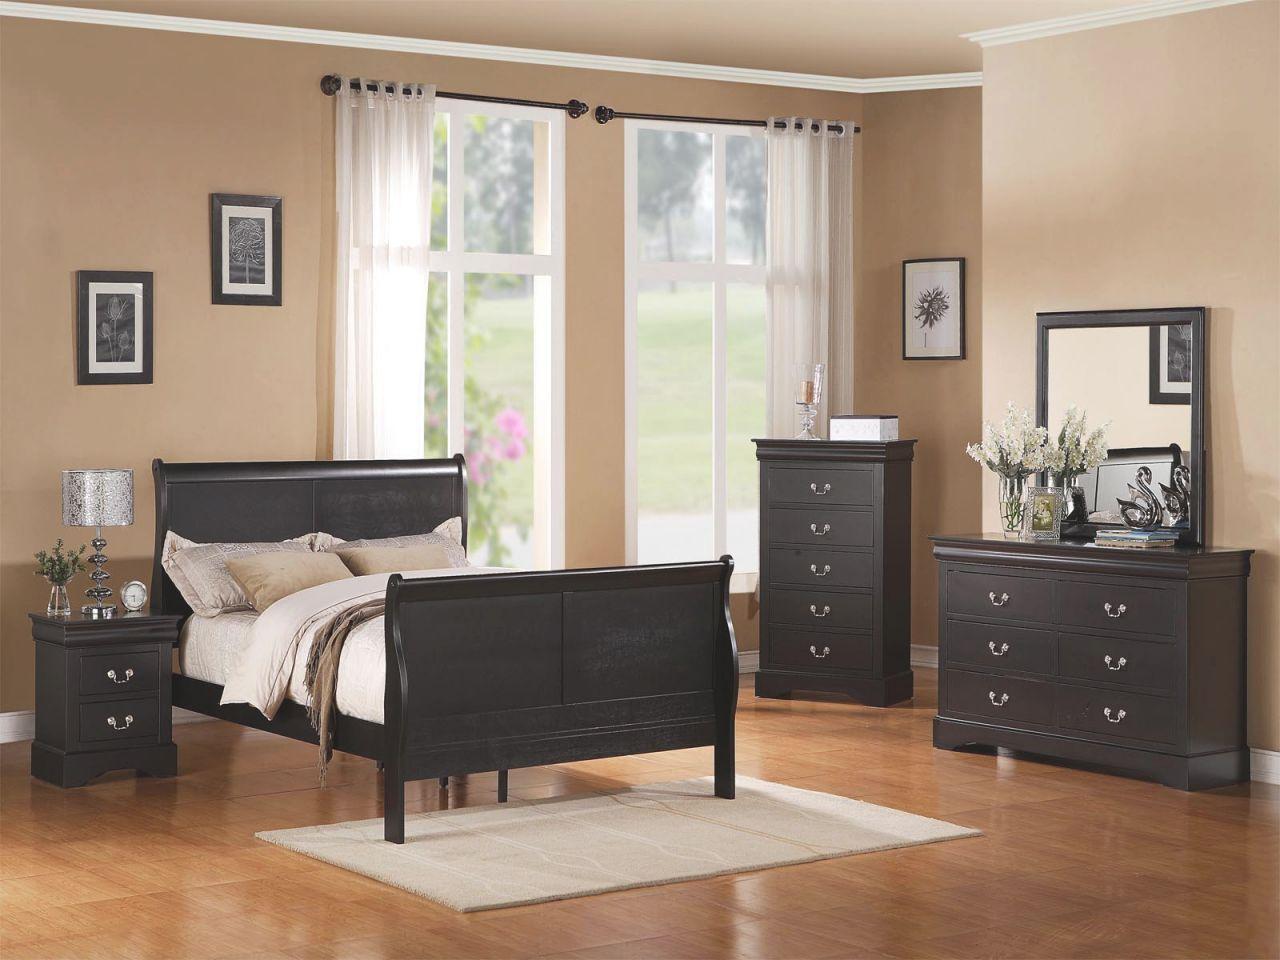 Standard Furniture Lewiston Panel Bedroom Set In Black for Cheap White Bedroom Furniture Sets